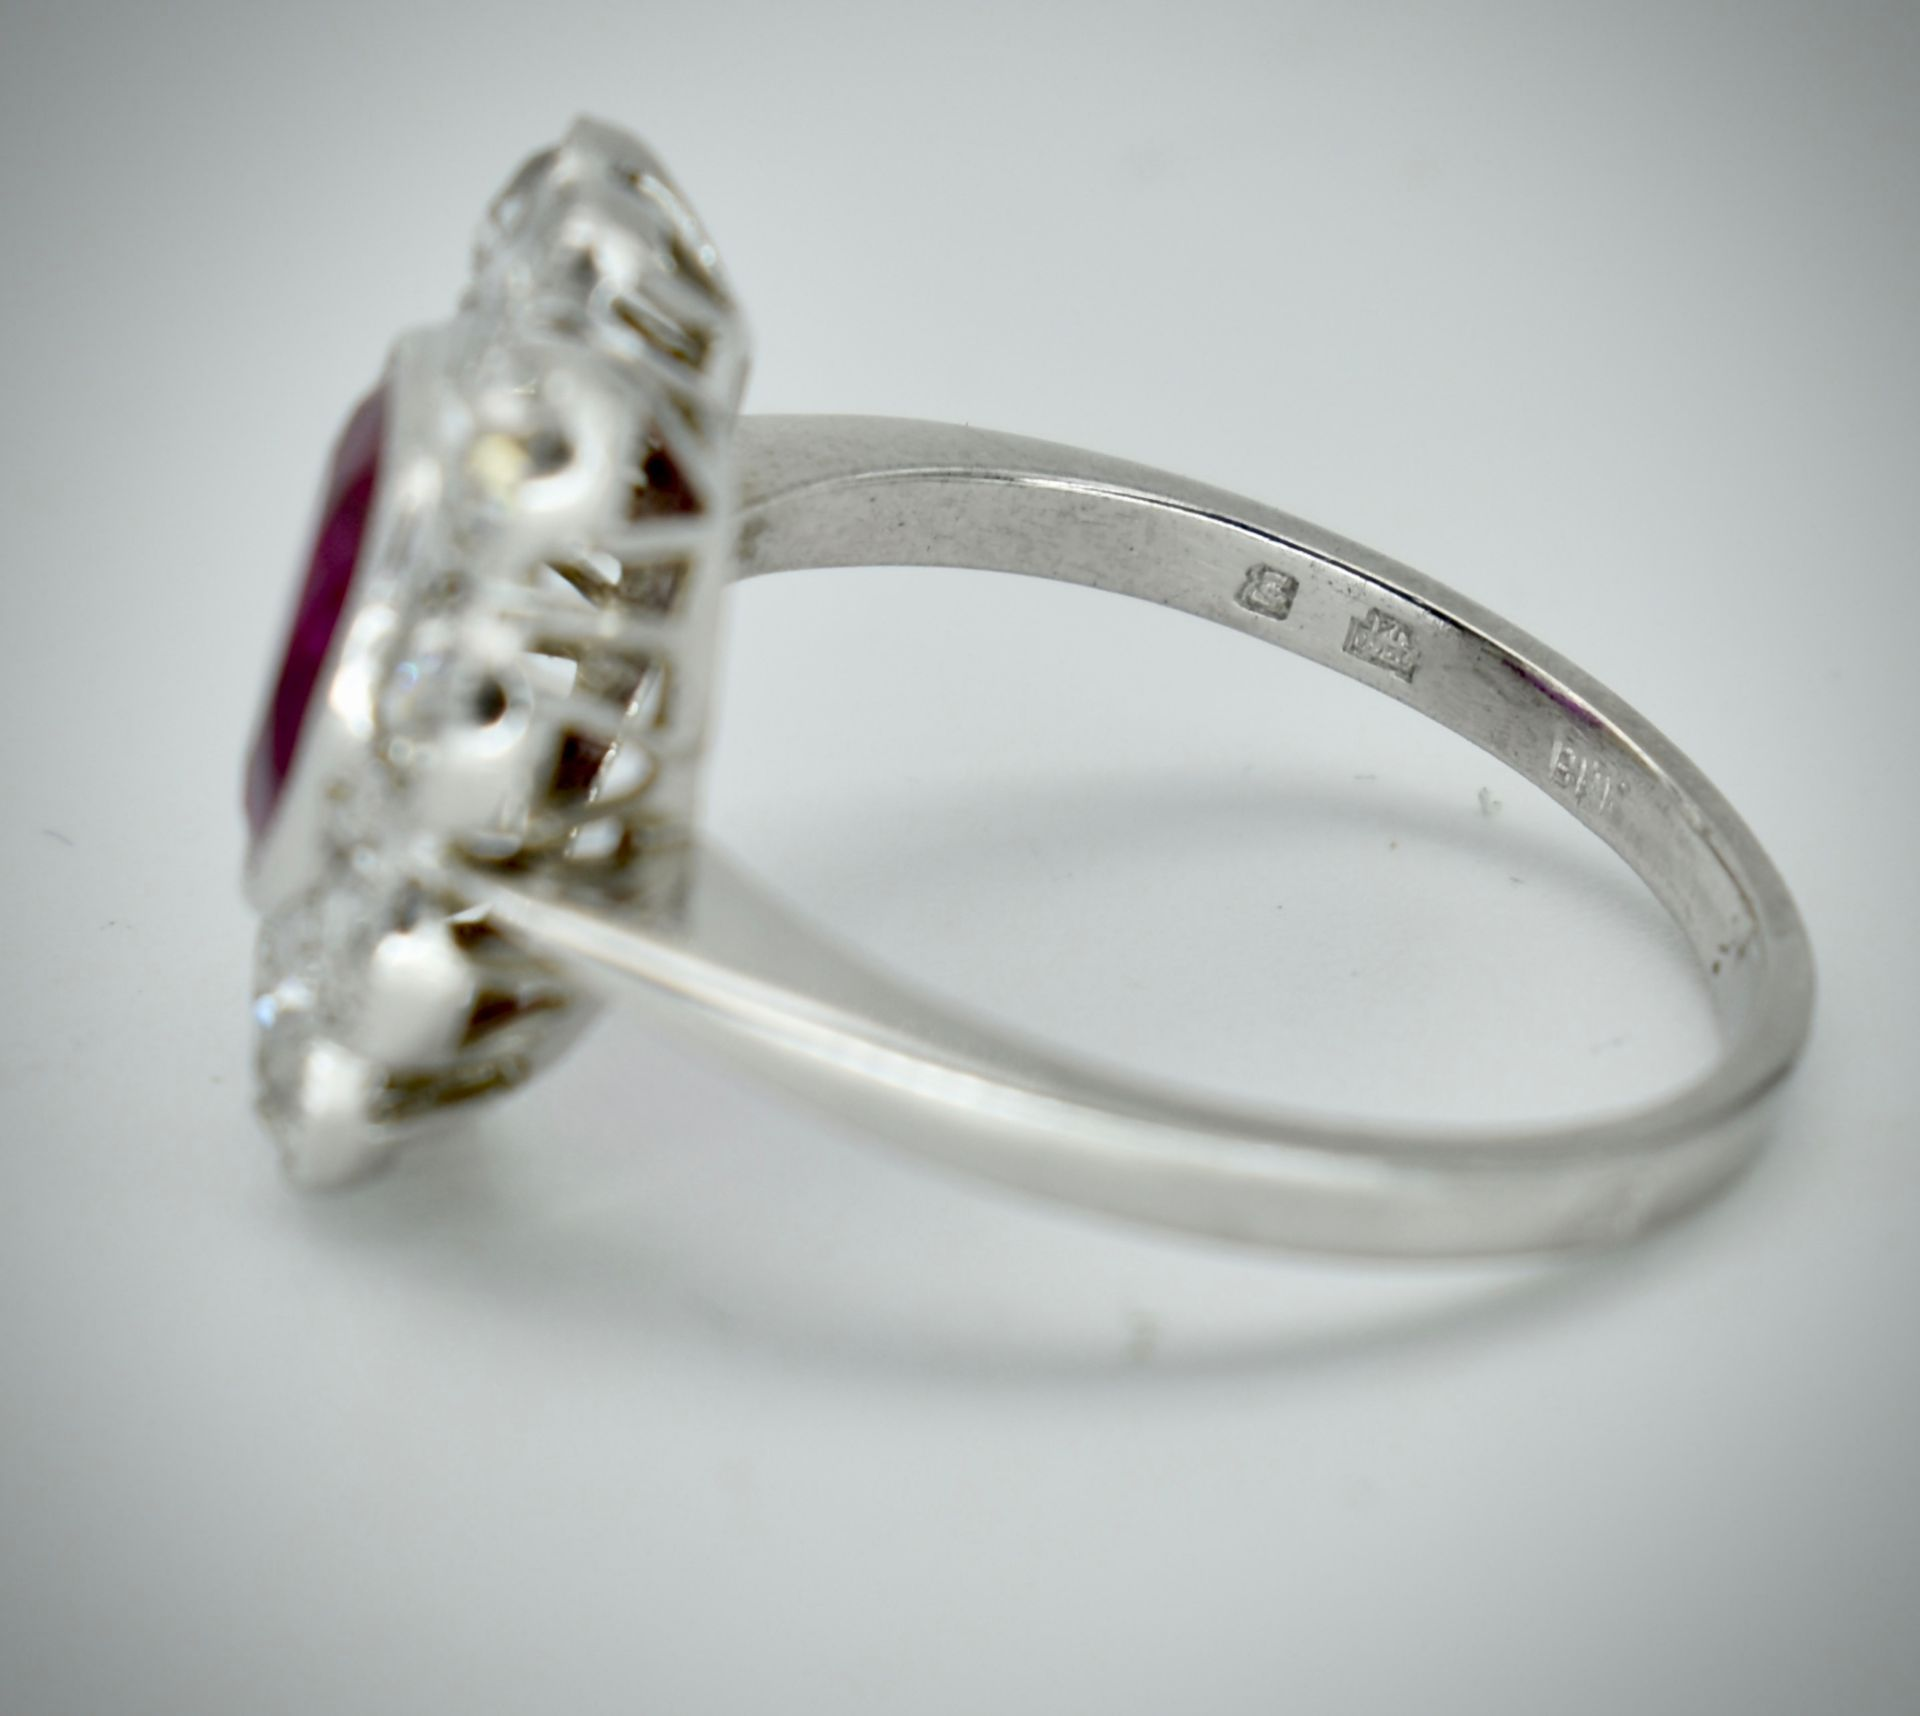 950 Platinum Burma Ruby & Diamond Cluster Ring - Image 4 of 5